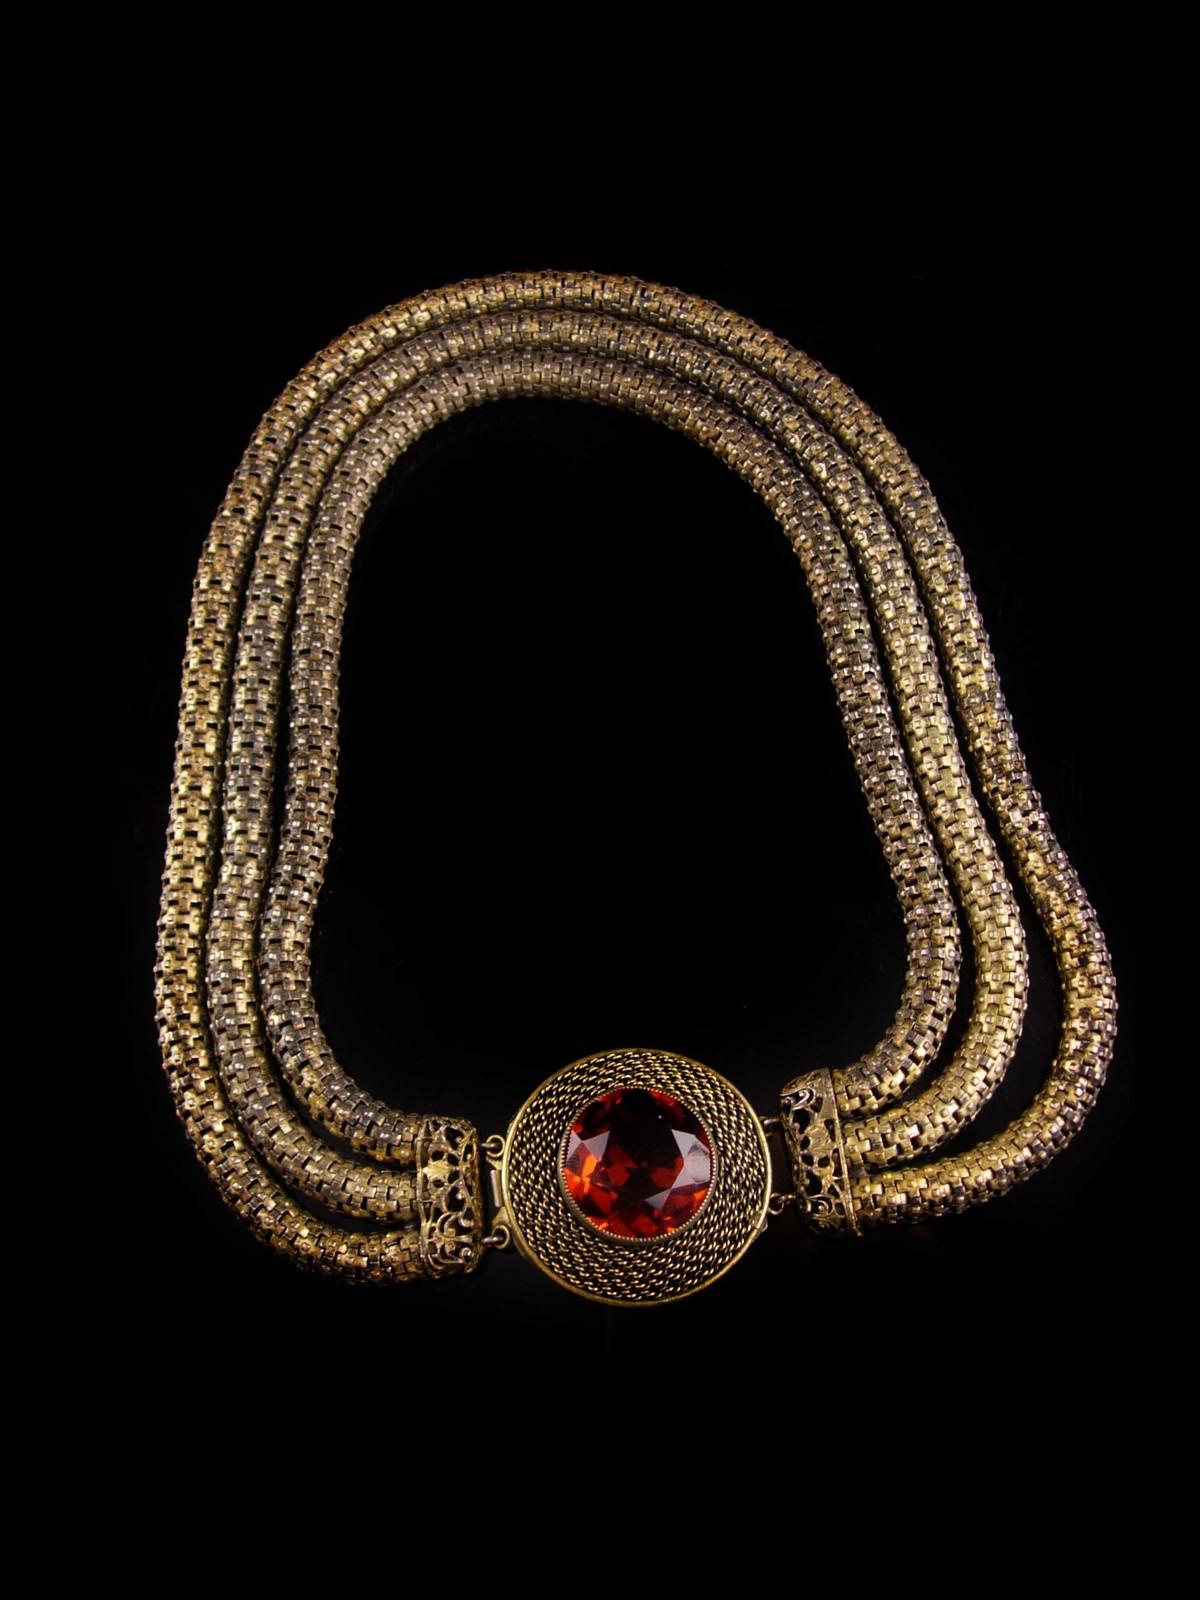 Antique Mesh Rope Necklace - 3 strand golden topaz centerpiece -  rhinestone sna